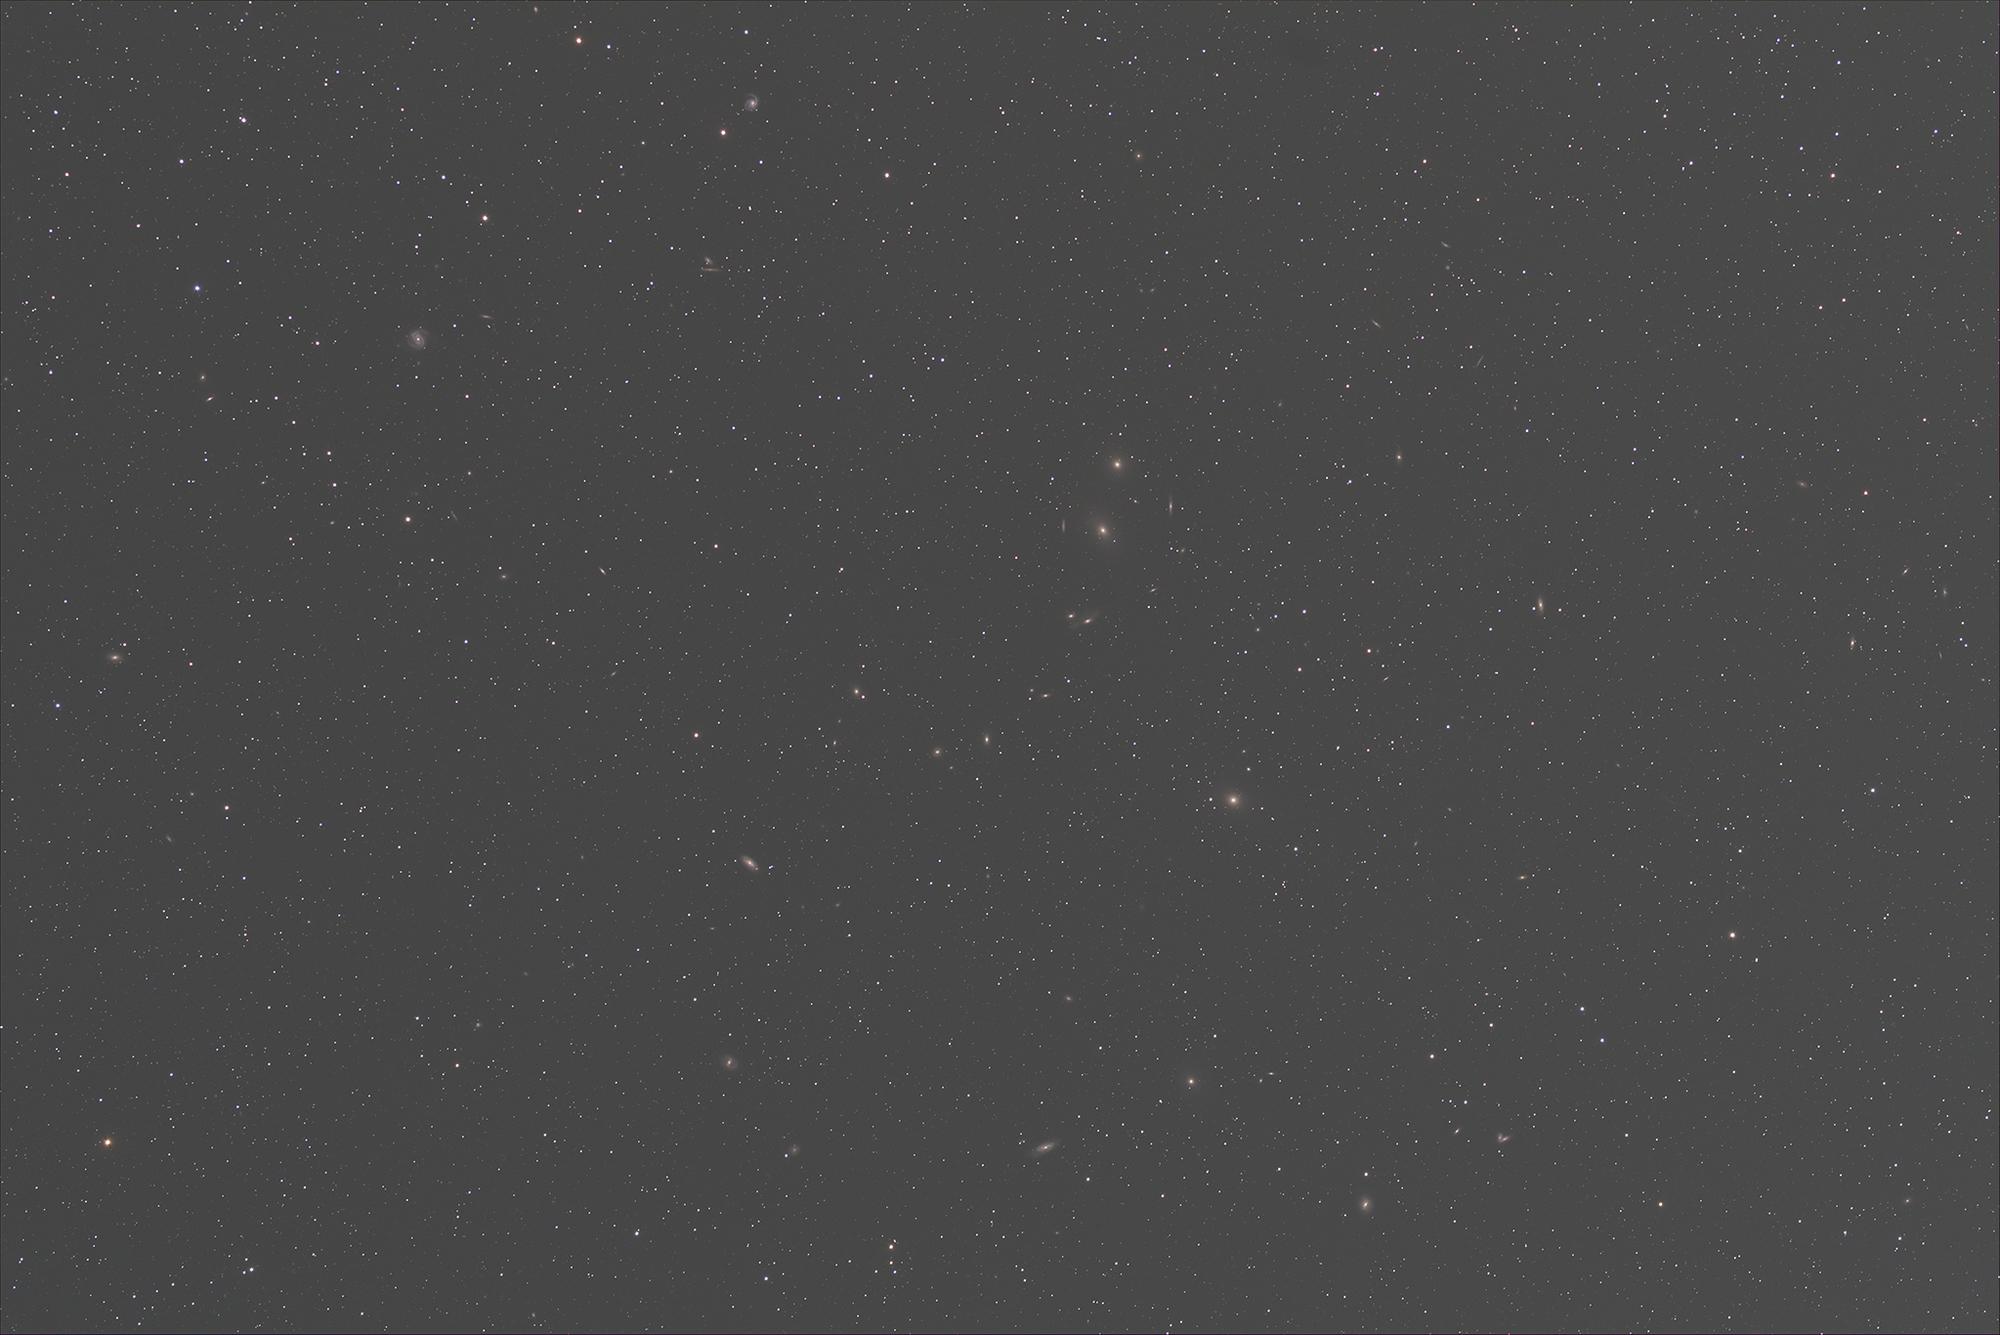 f:id:snct-astro:20190723222041j:plain